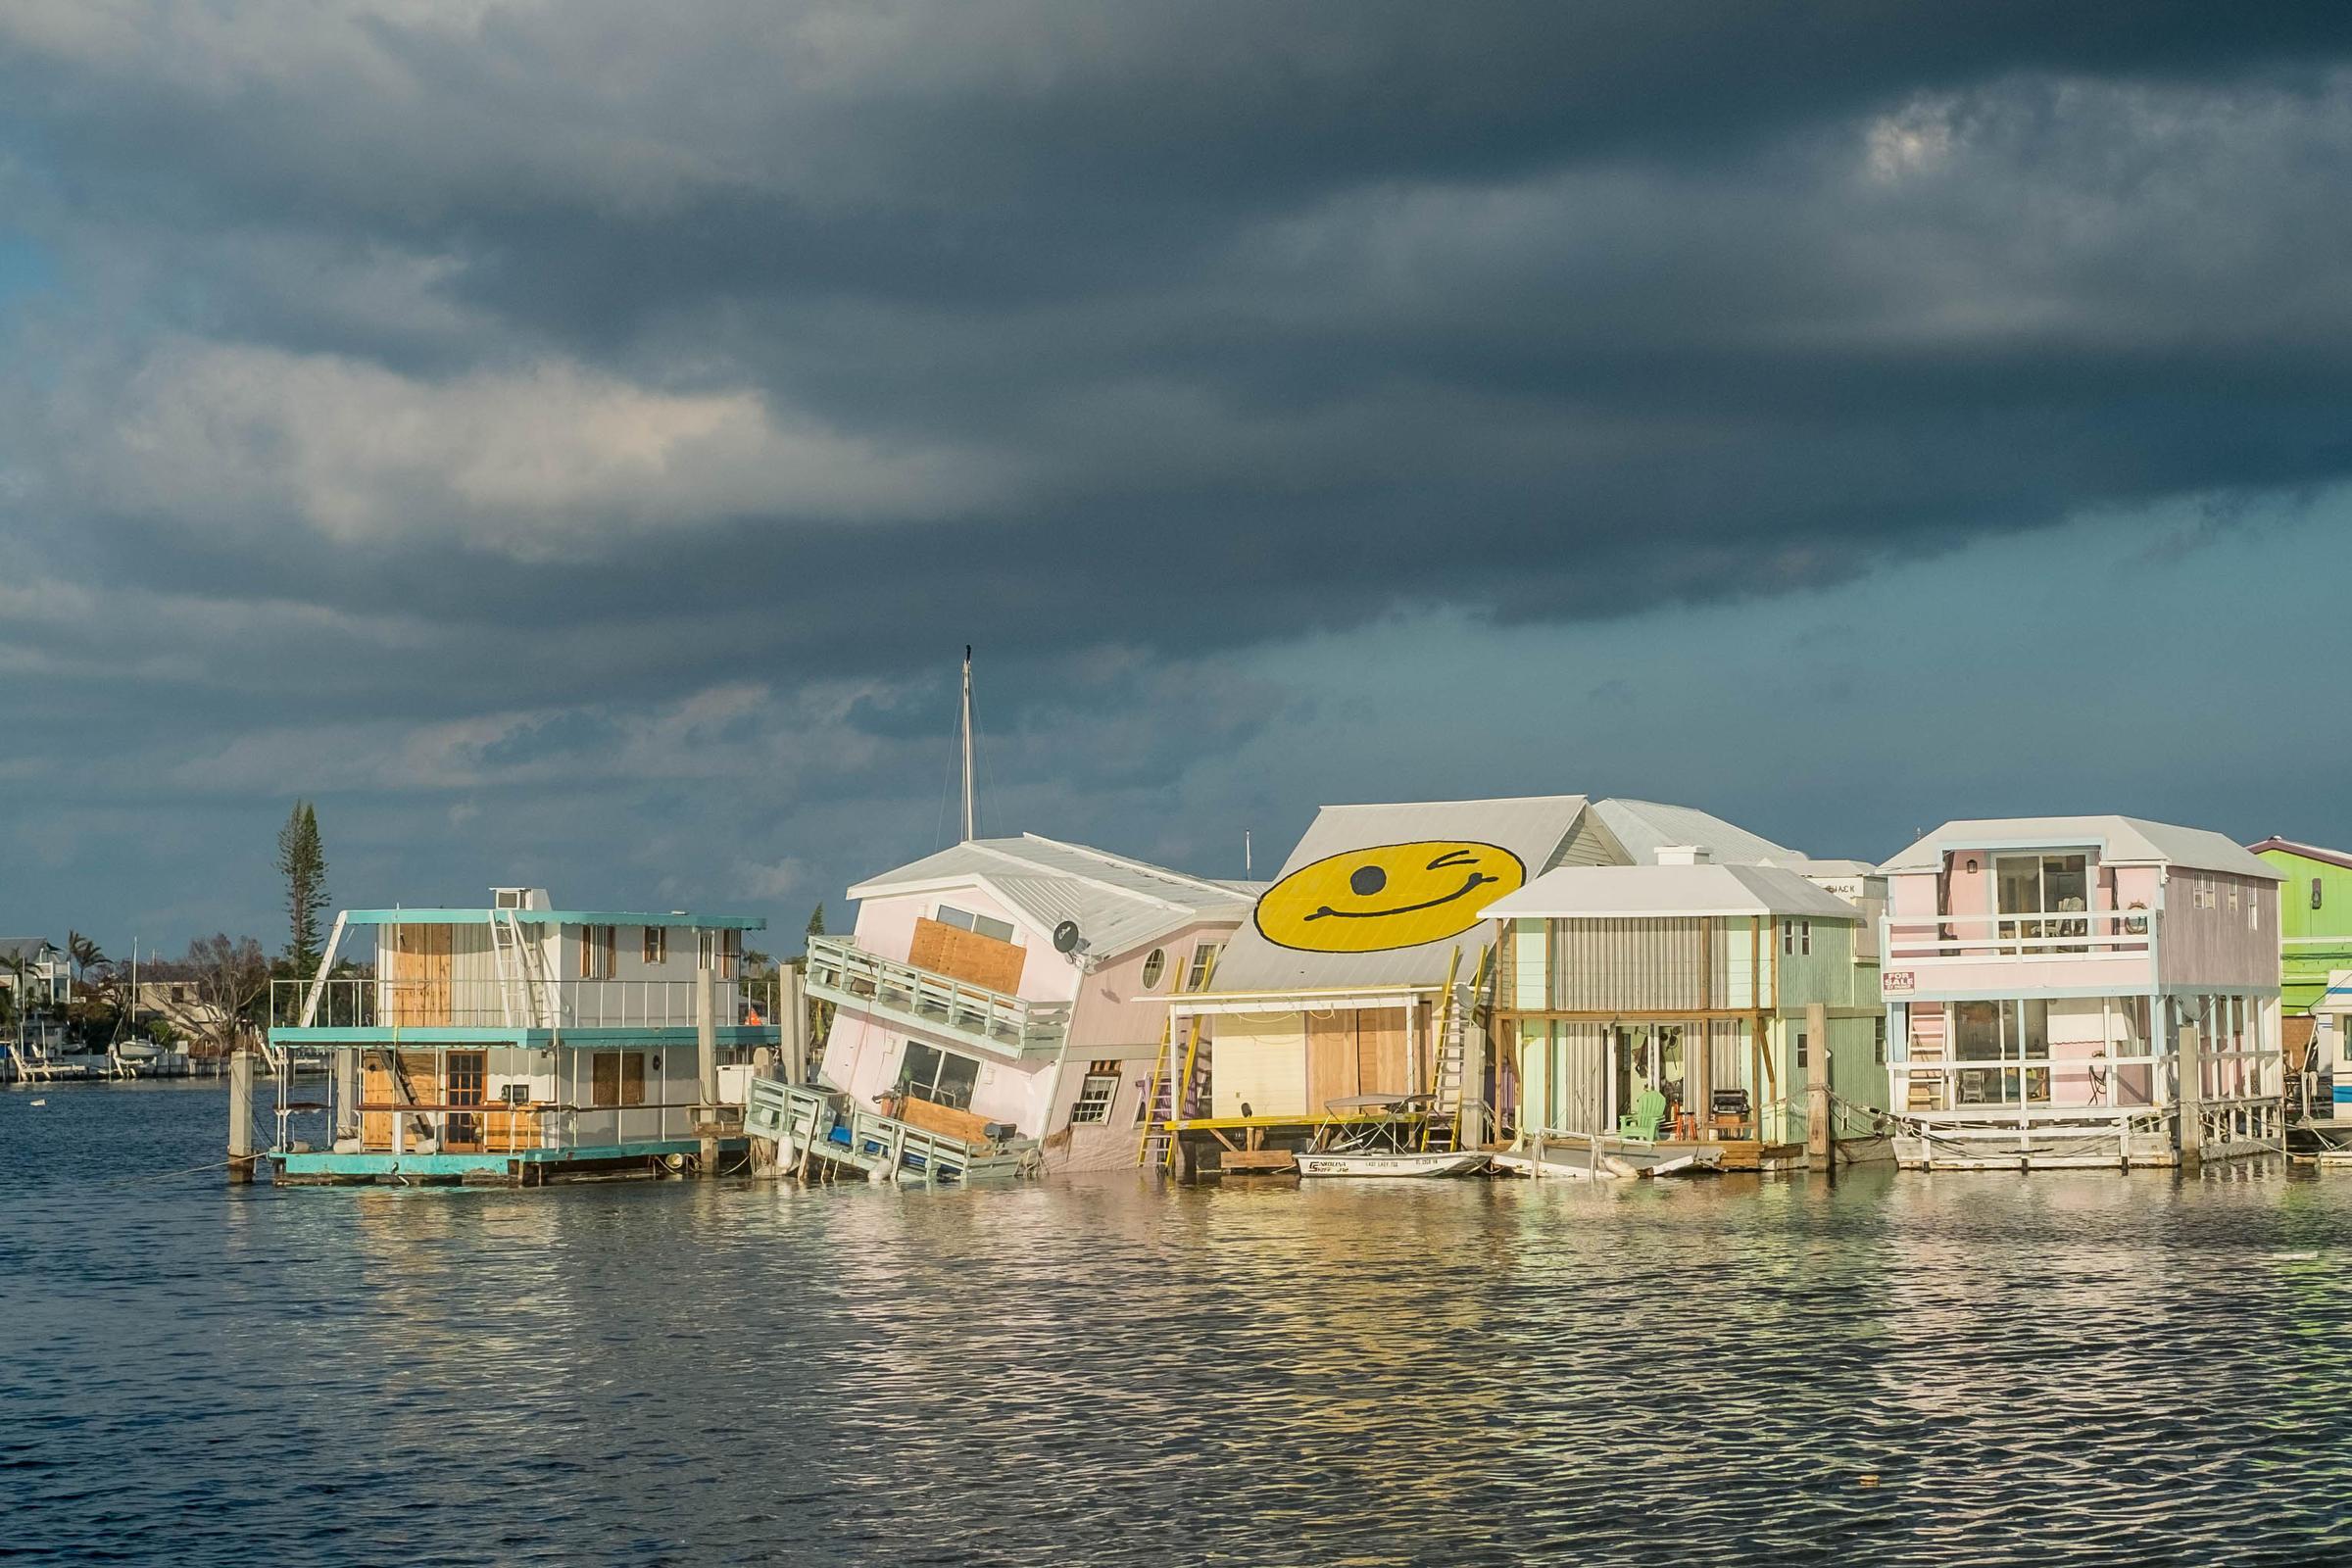 Insurers estimate losses from hurricanes